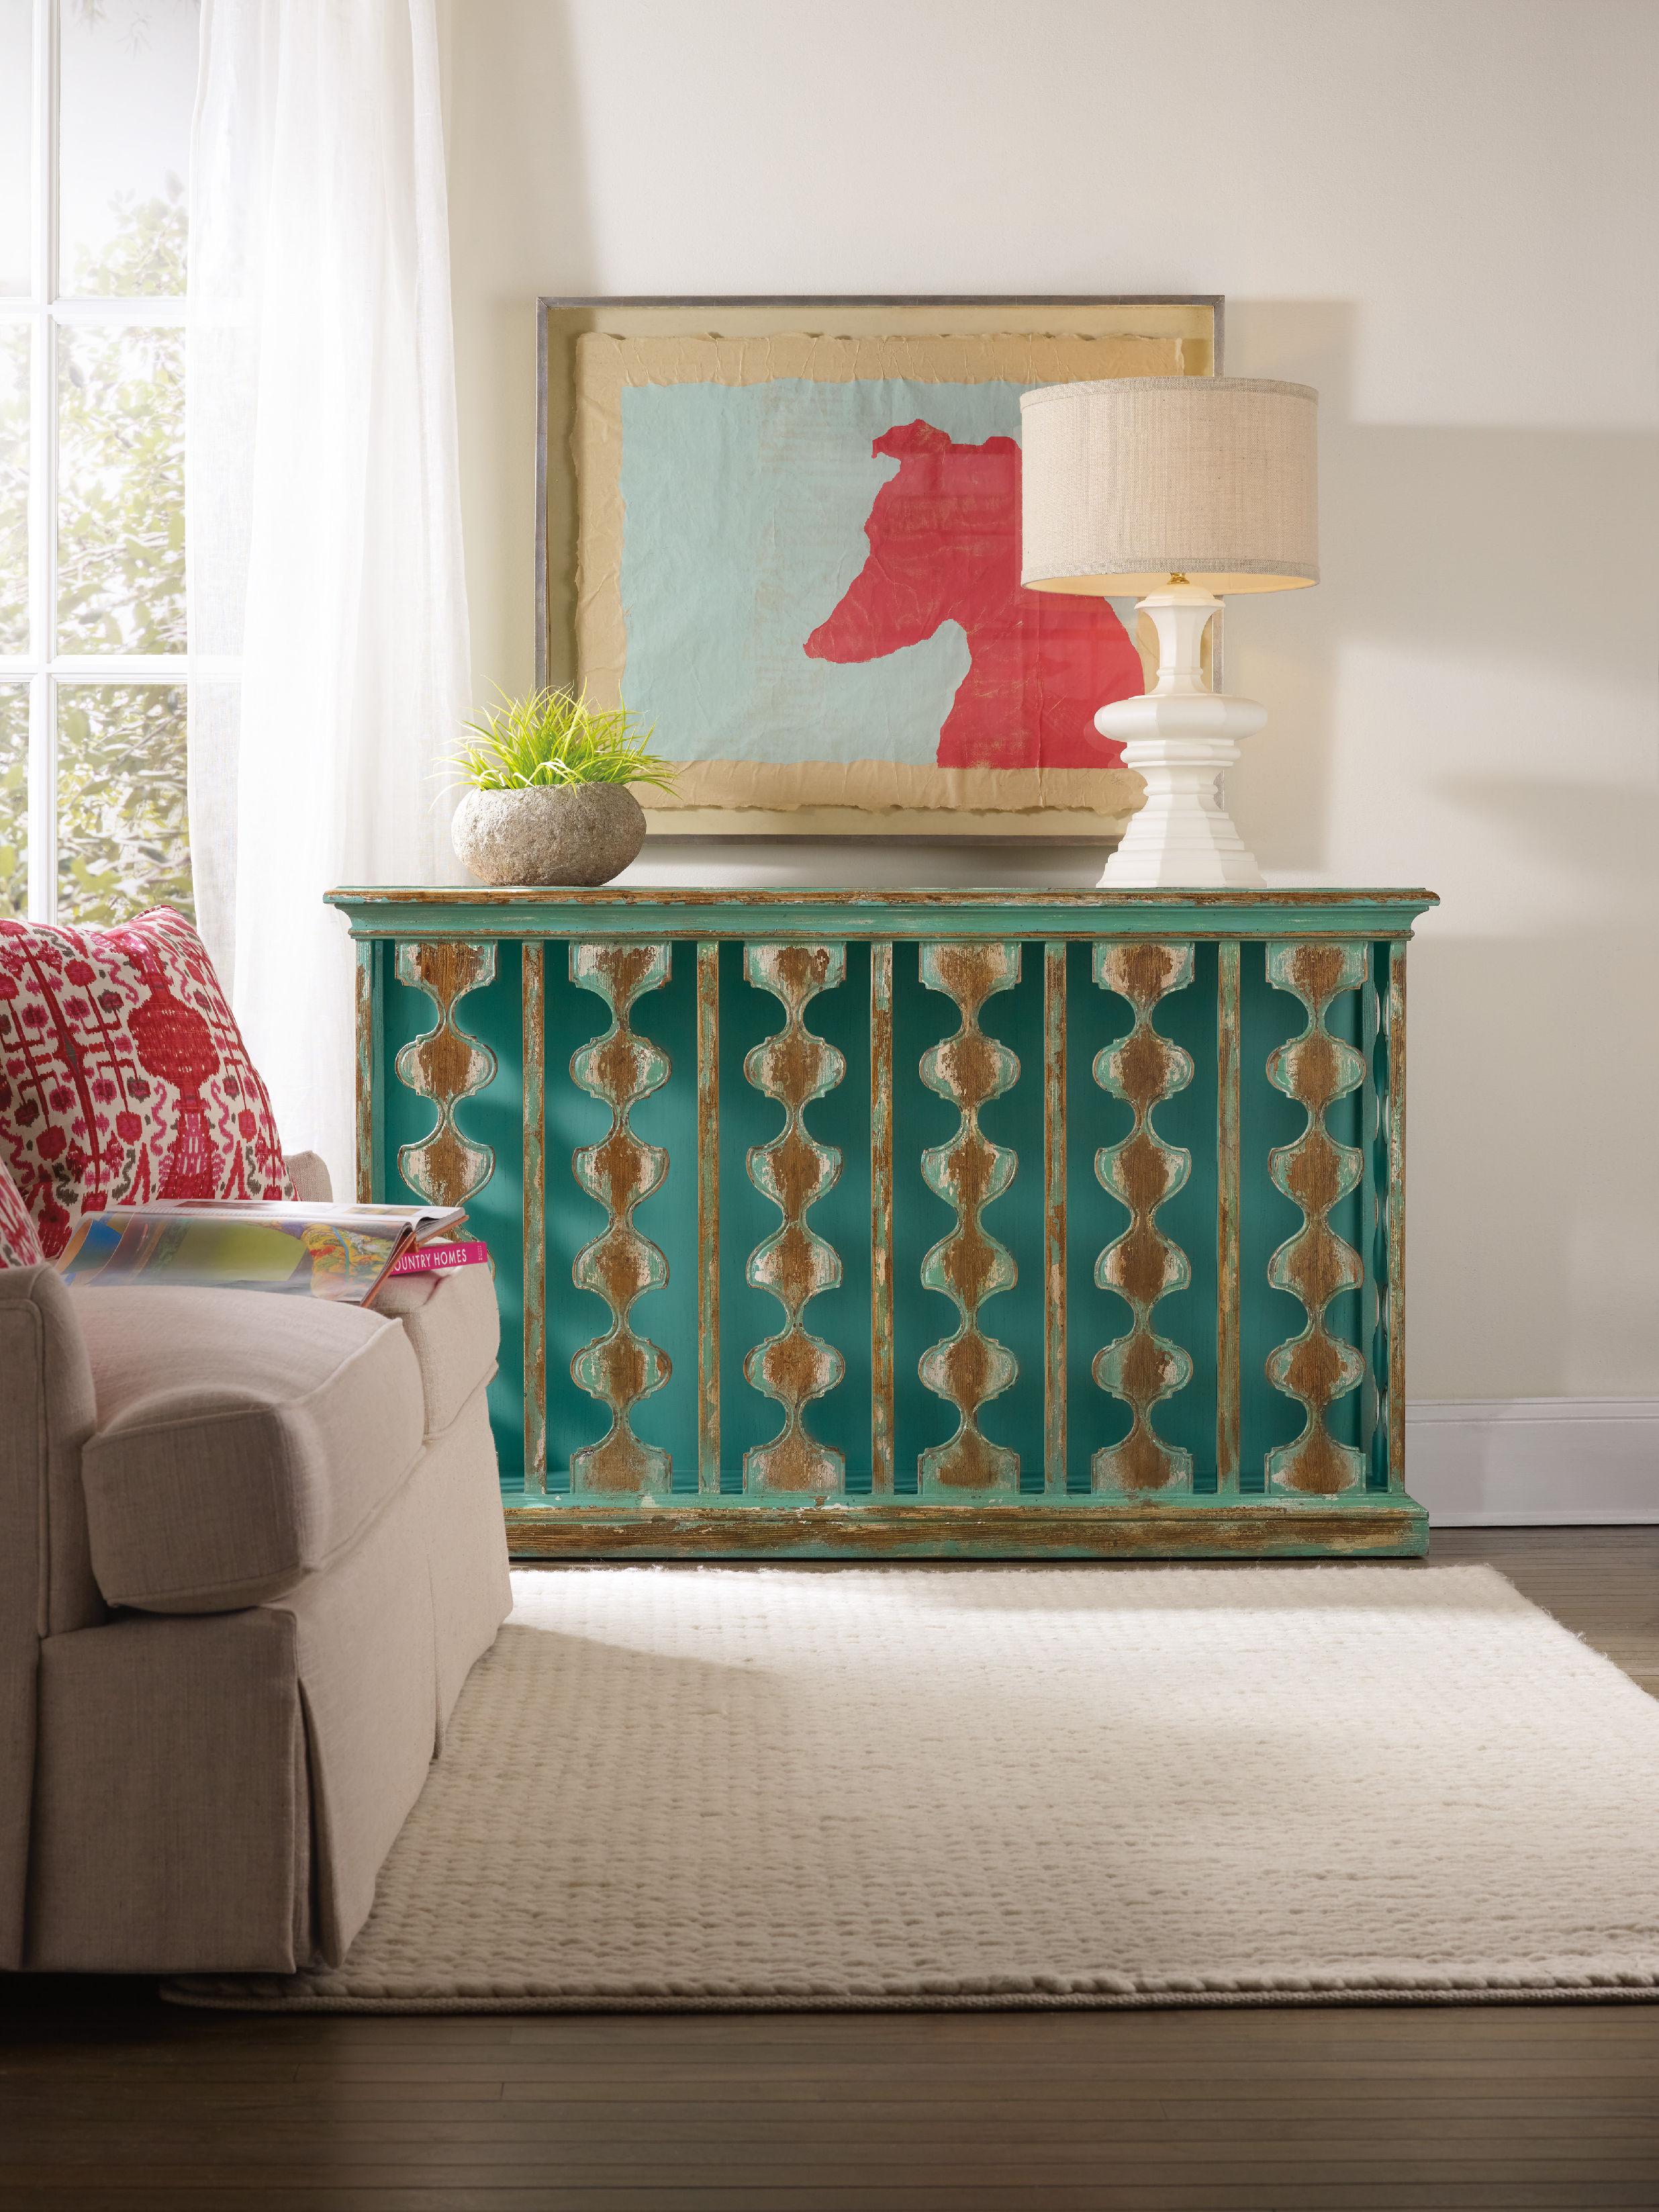 Magnificent Hooker Furniture Sanctuary Console Table 5406 85001 Home Interior And Landscaping Mentranervesignezvosmurscom